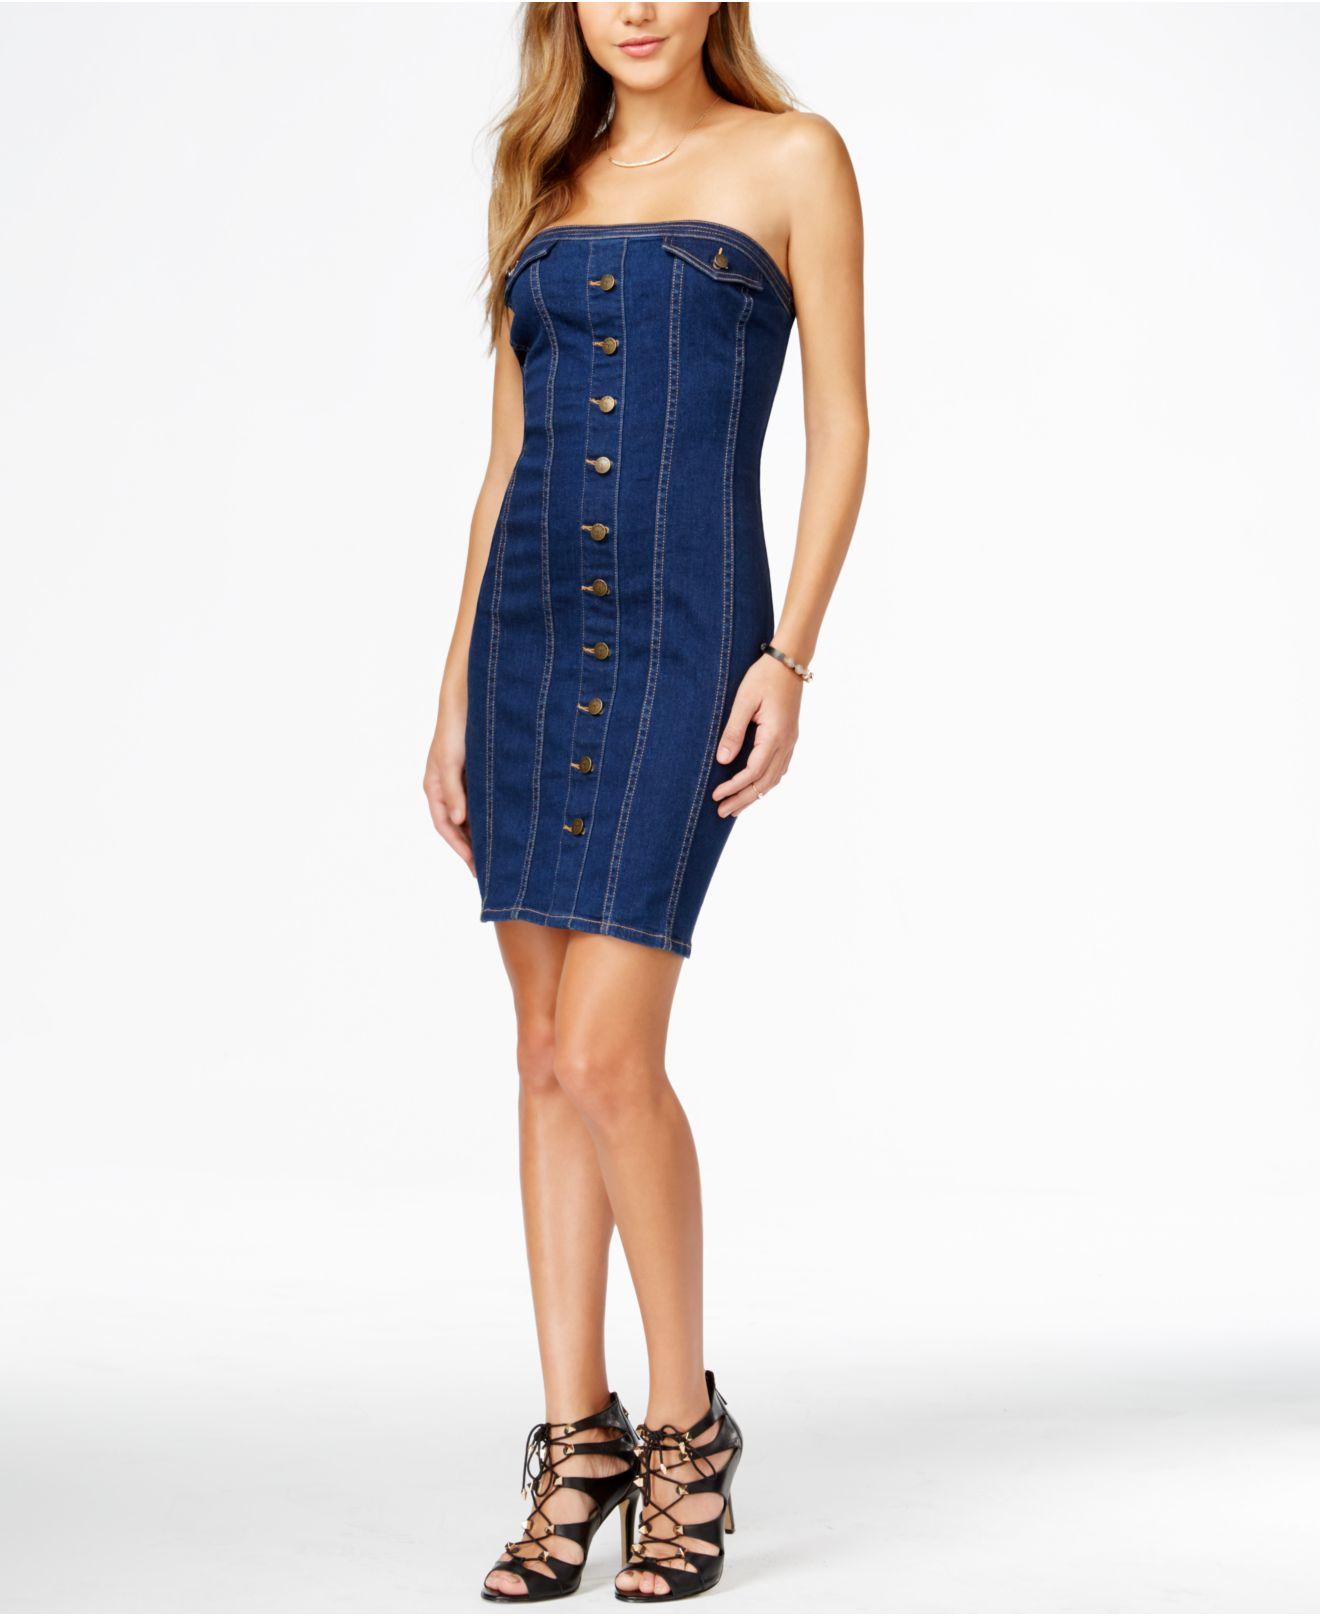 1da33fe137 Lyst - Guess Strapless Denim Bodycon Dress in Blue